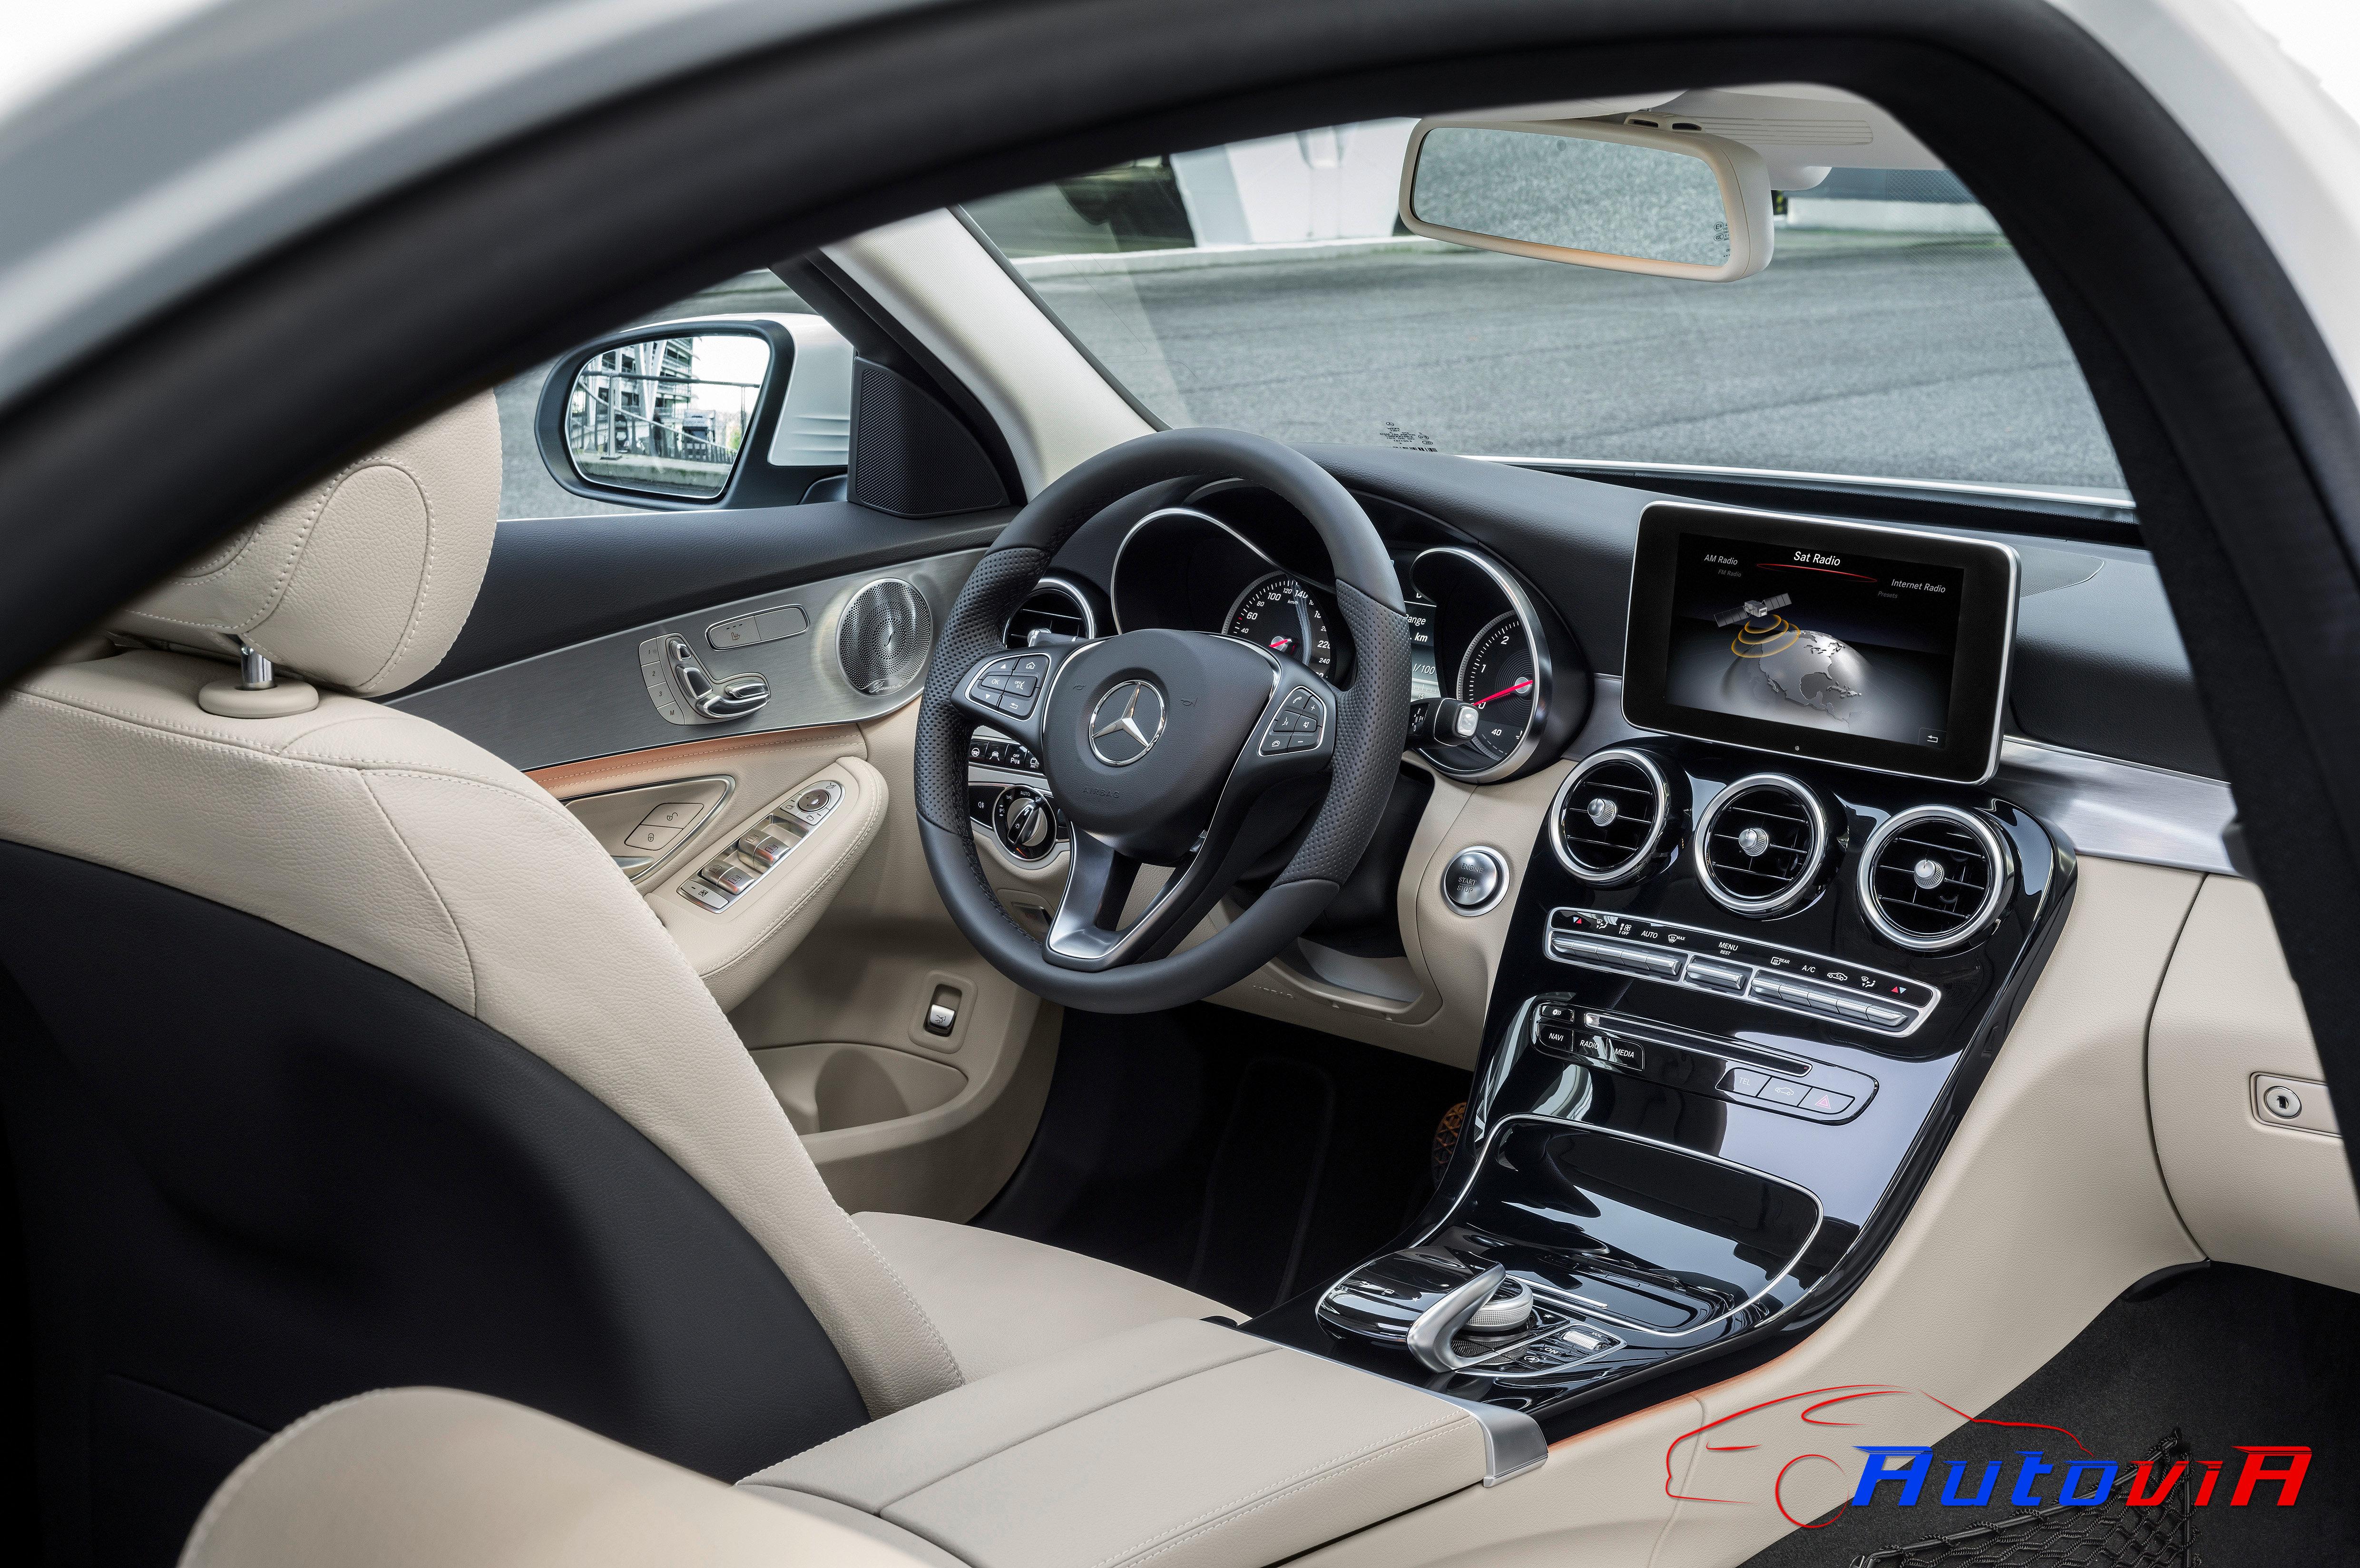 Mercedes benz clase c c 250 bluetec 2014 008 for Mercedes benz c 250 2014